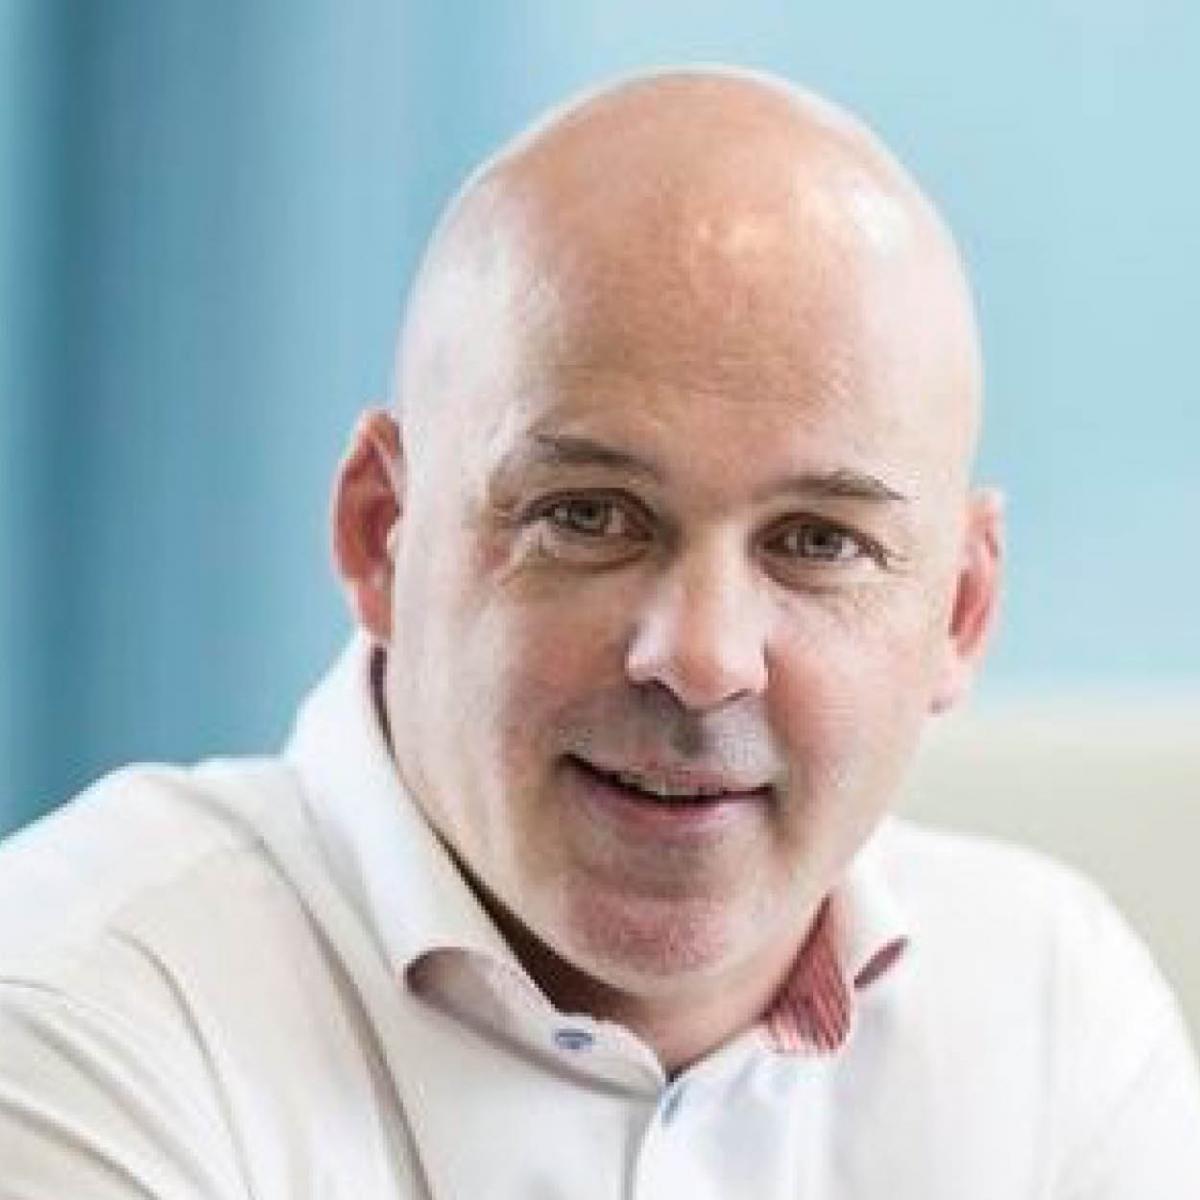 Jan-Olav Dagfinrud Salgssjef Partnersalg i Tussa IKT